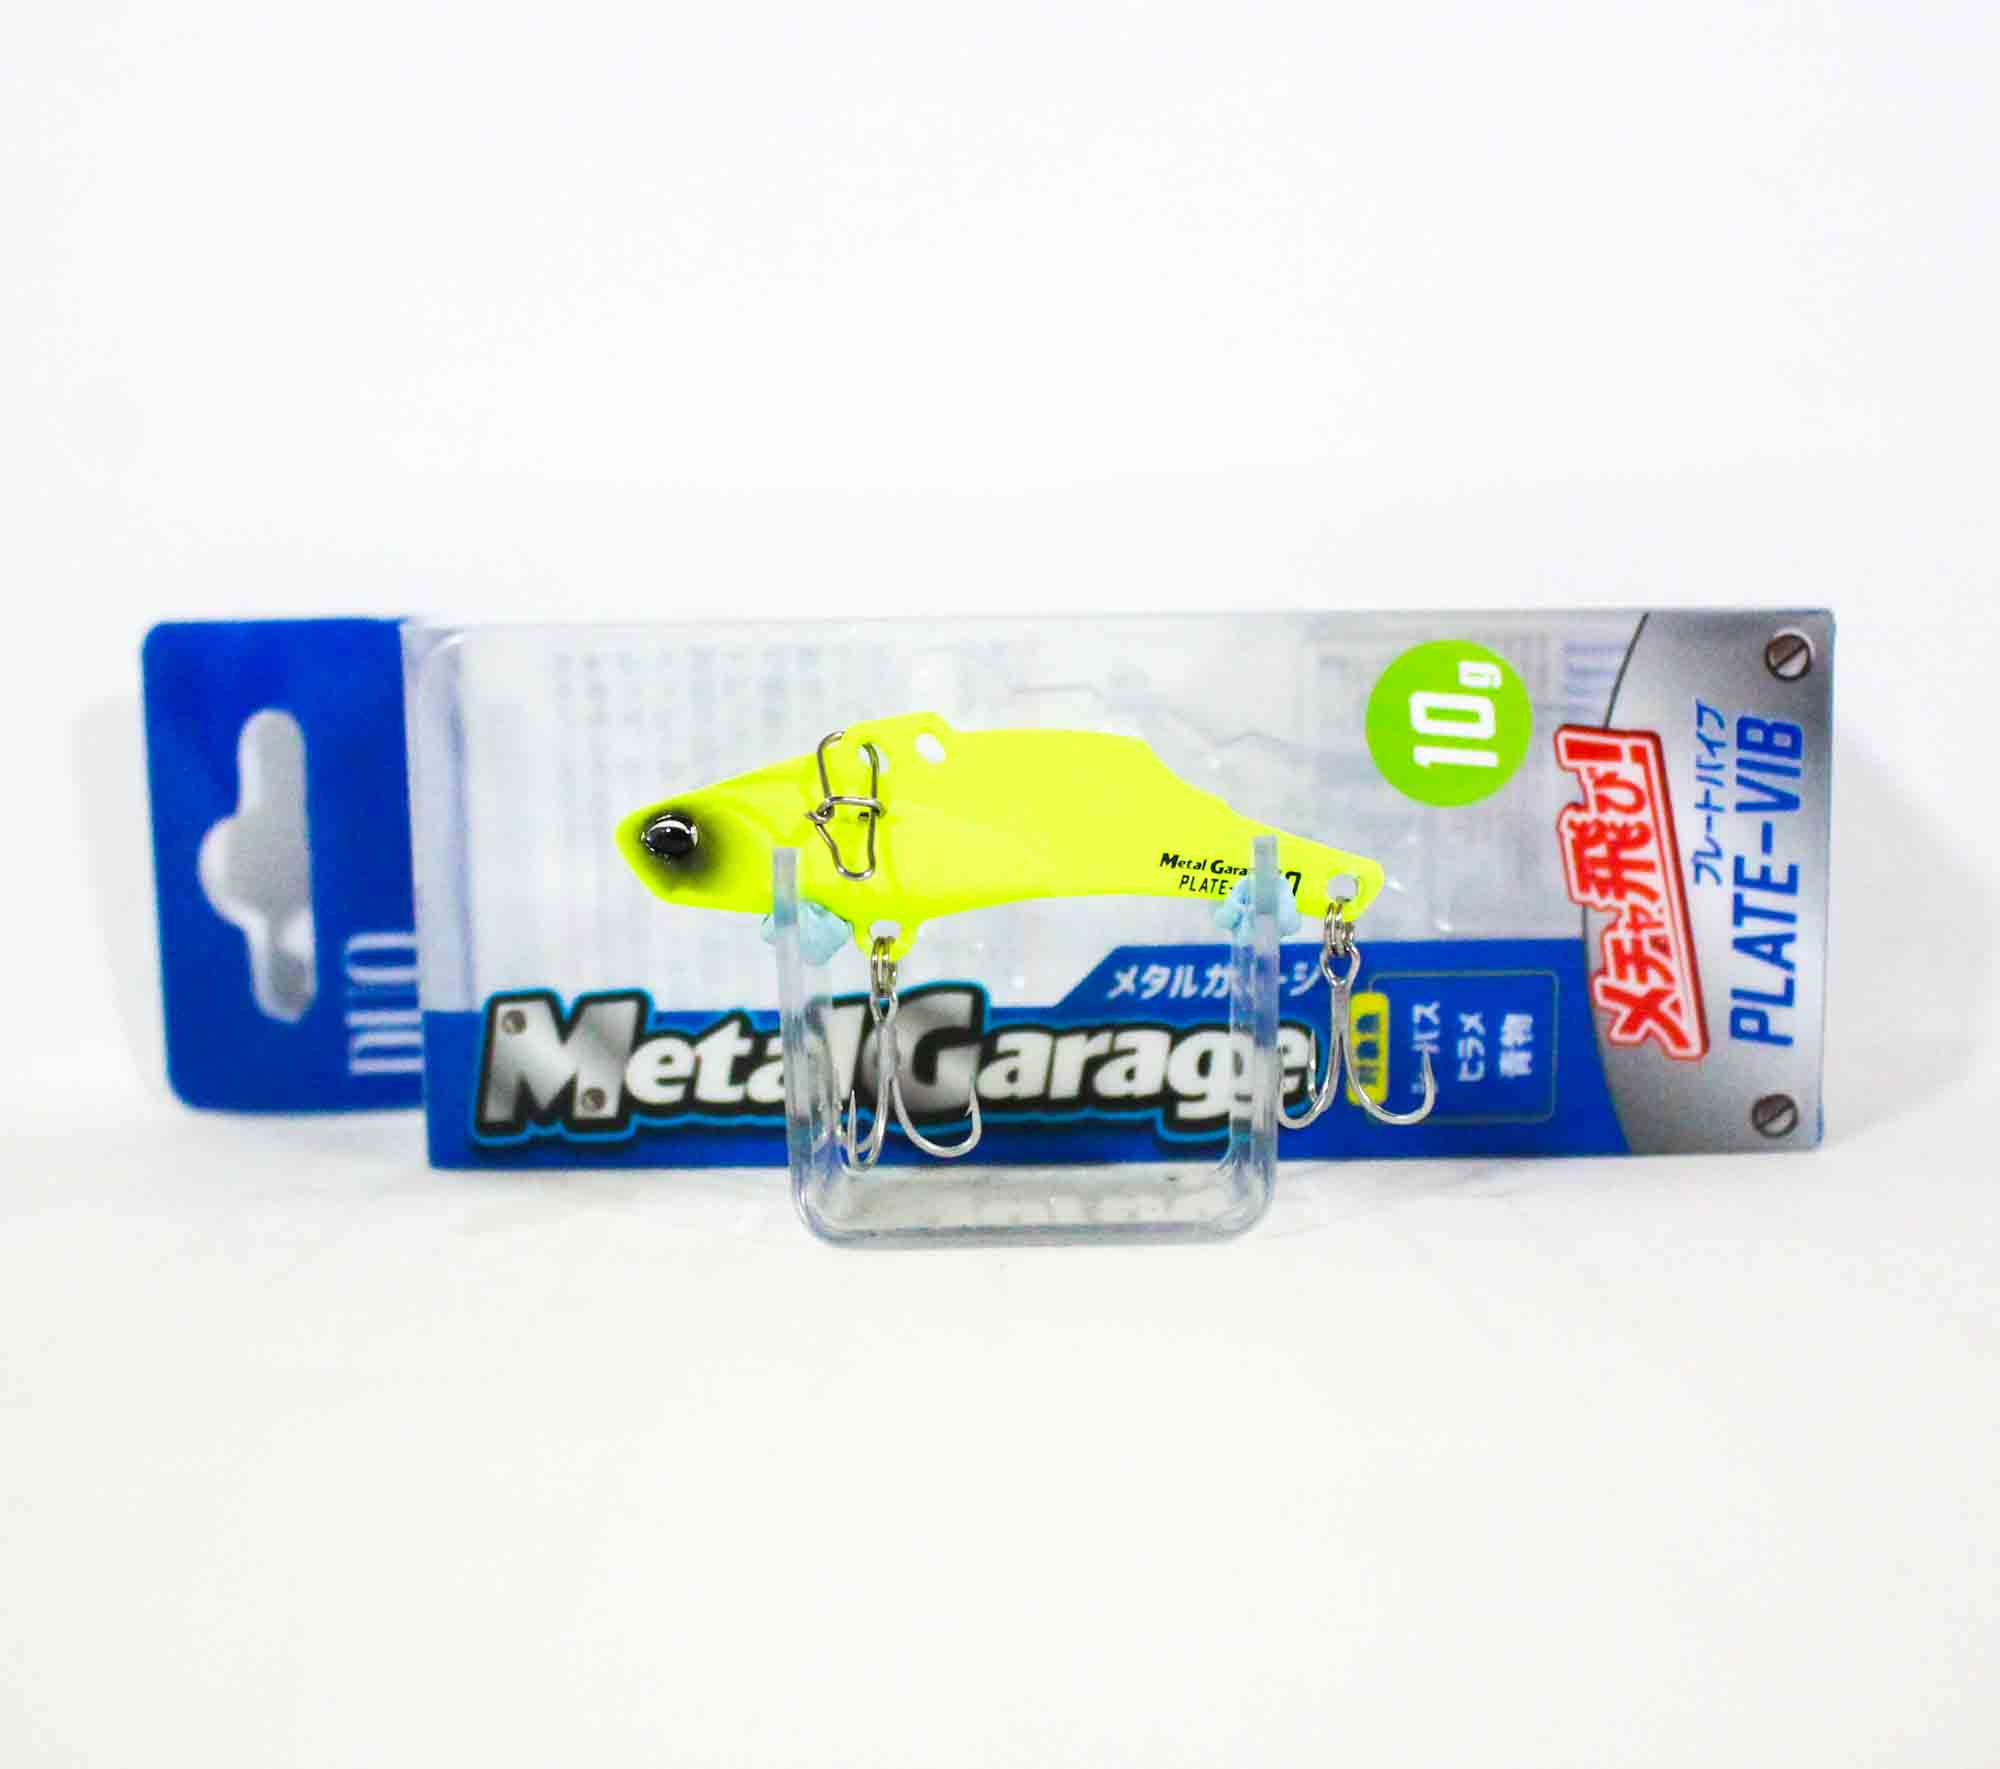 Duo Realis Metal Garage Plate Vib Sinking Lure 20 grams PXA0478-4969 Details about  /